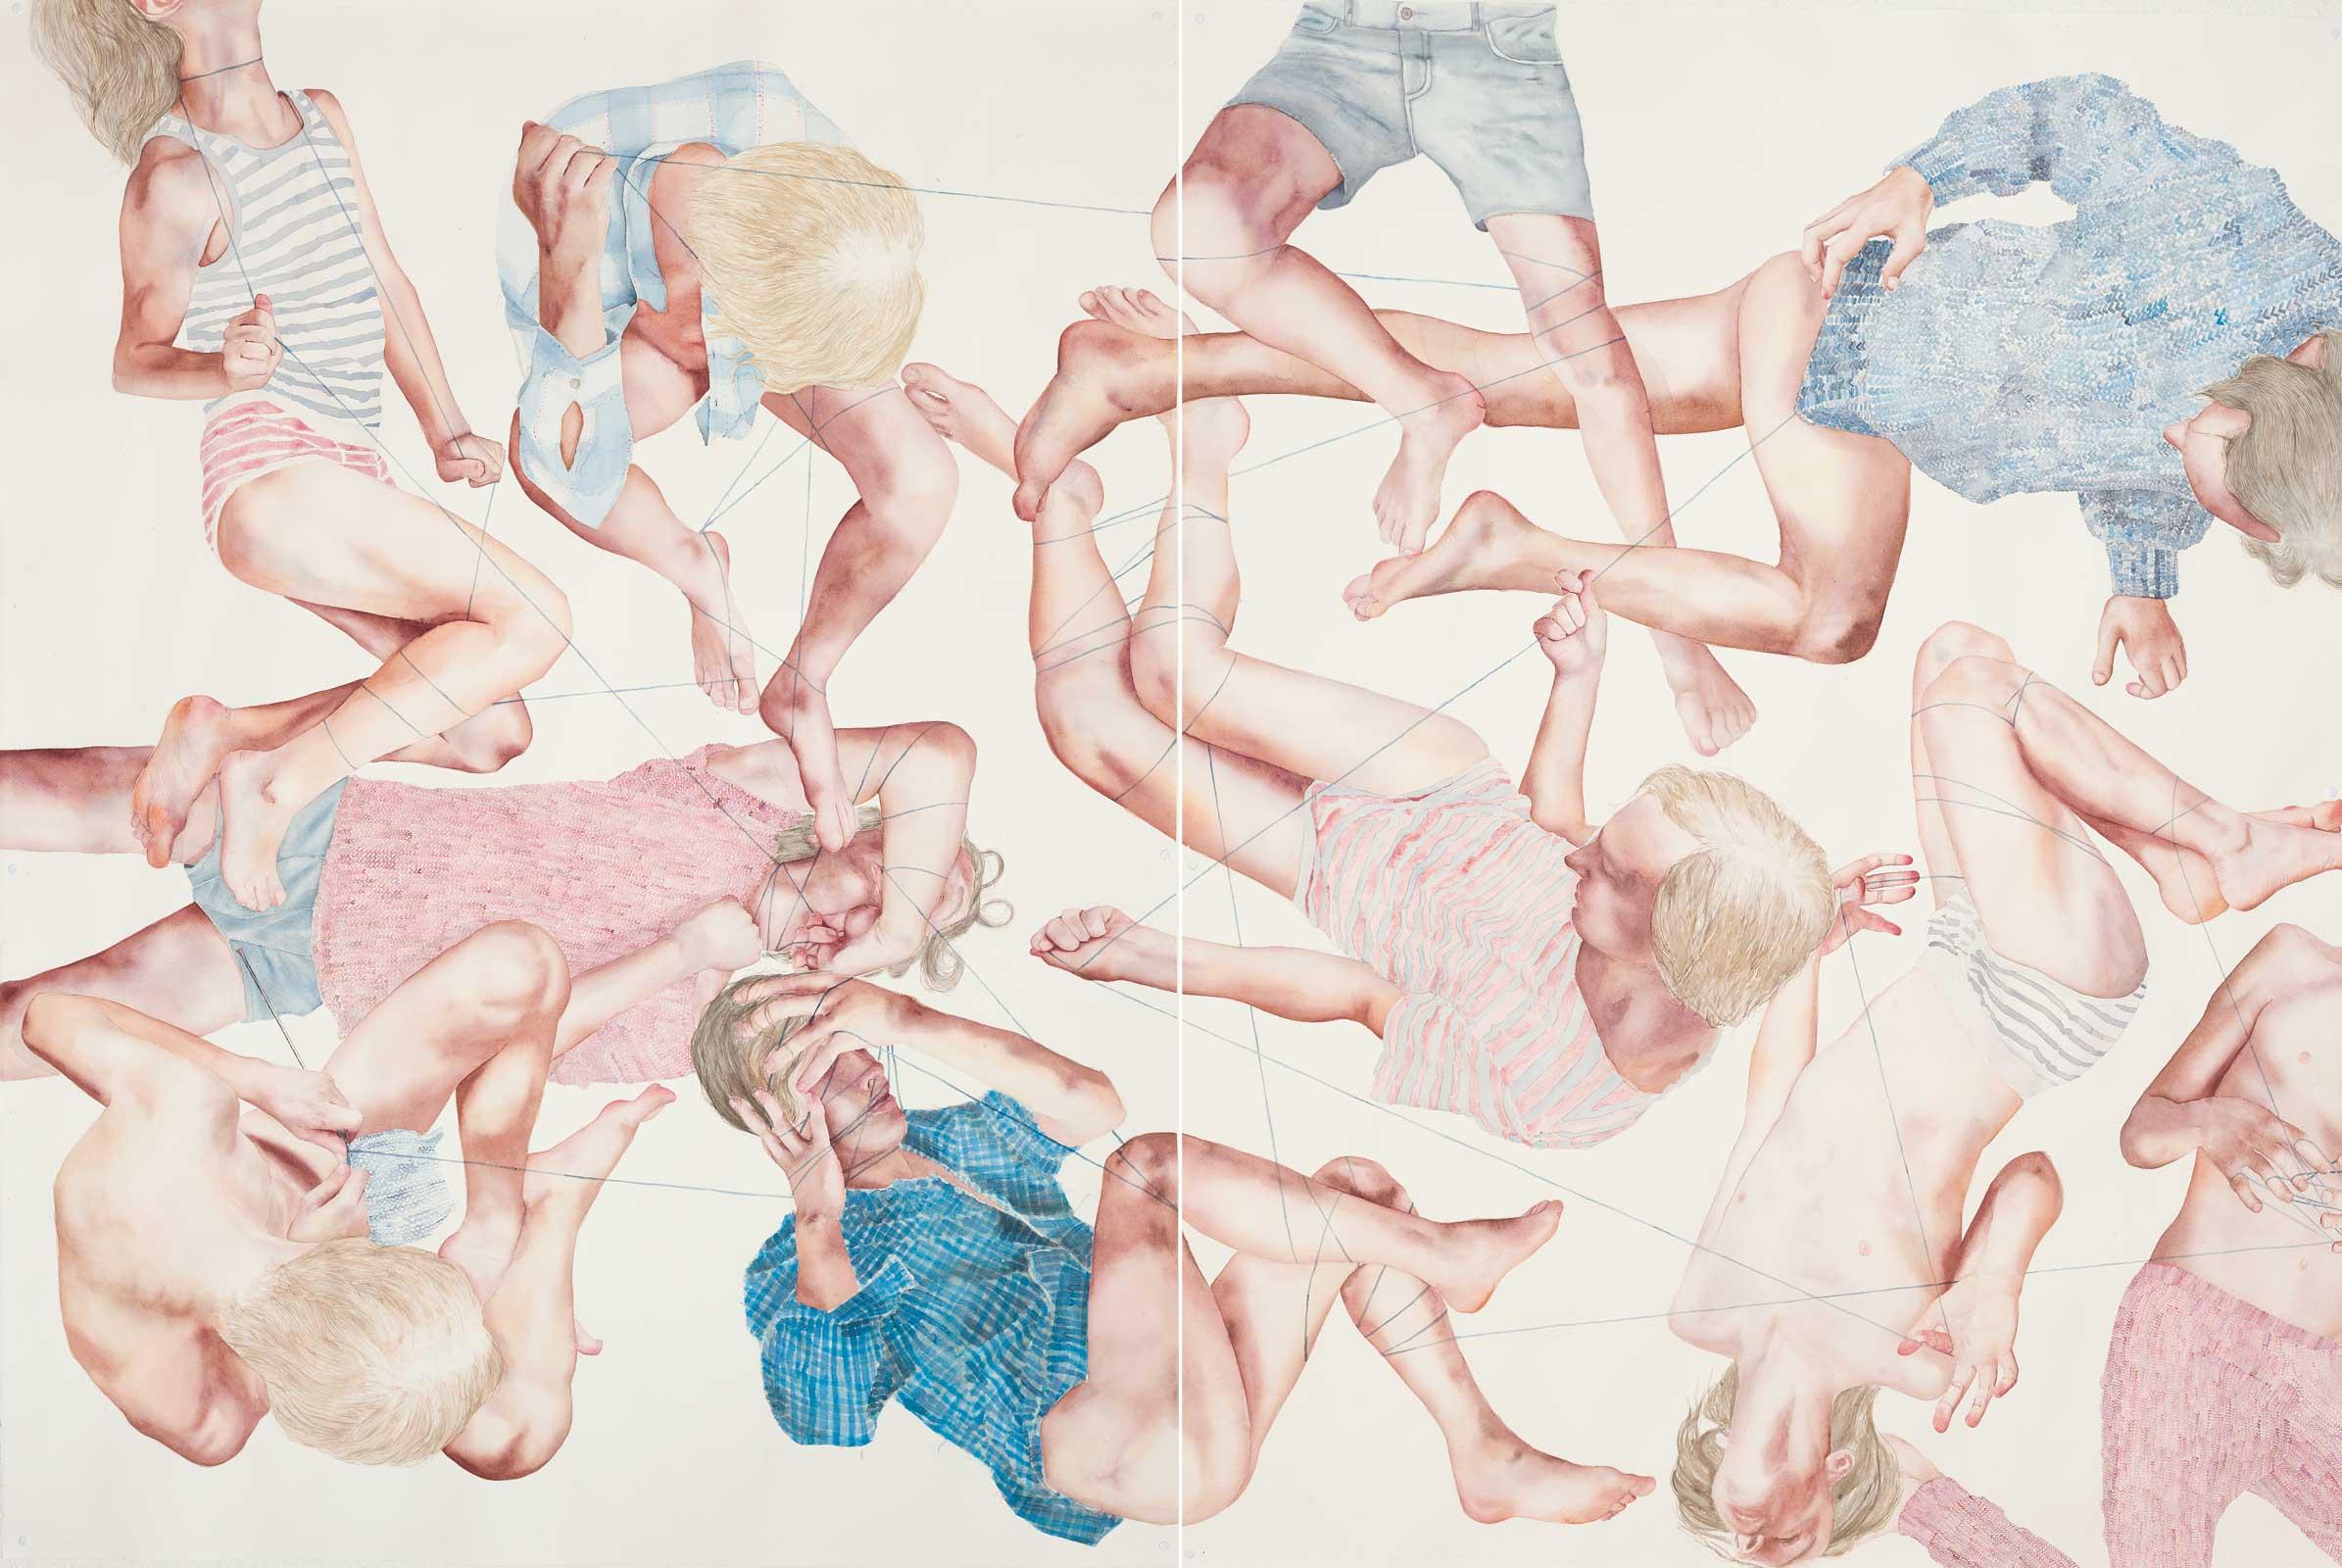 Juncture, 2016. Watercolor on paper. 150x224 cm